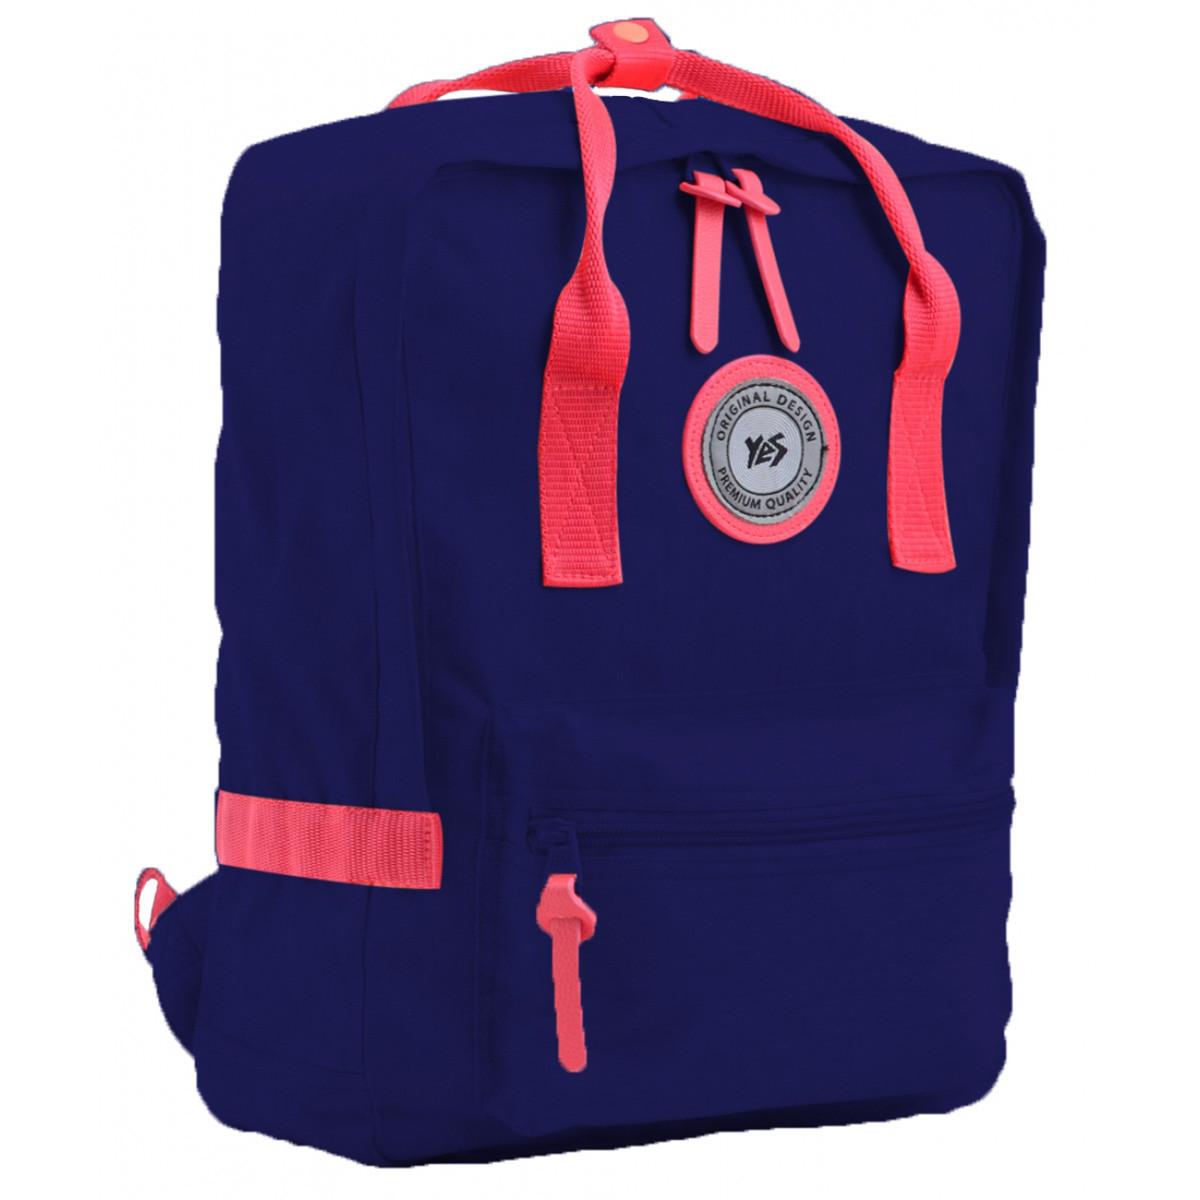 Рюкзак подростковый YES ST-24 Navy peony, 36*25.5*13.5 555581